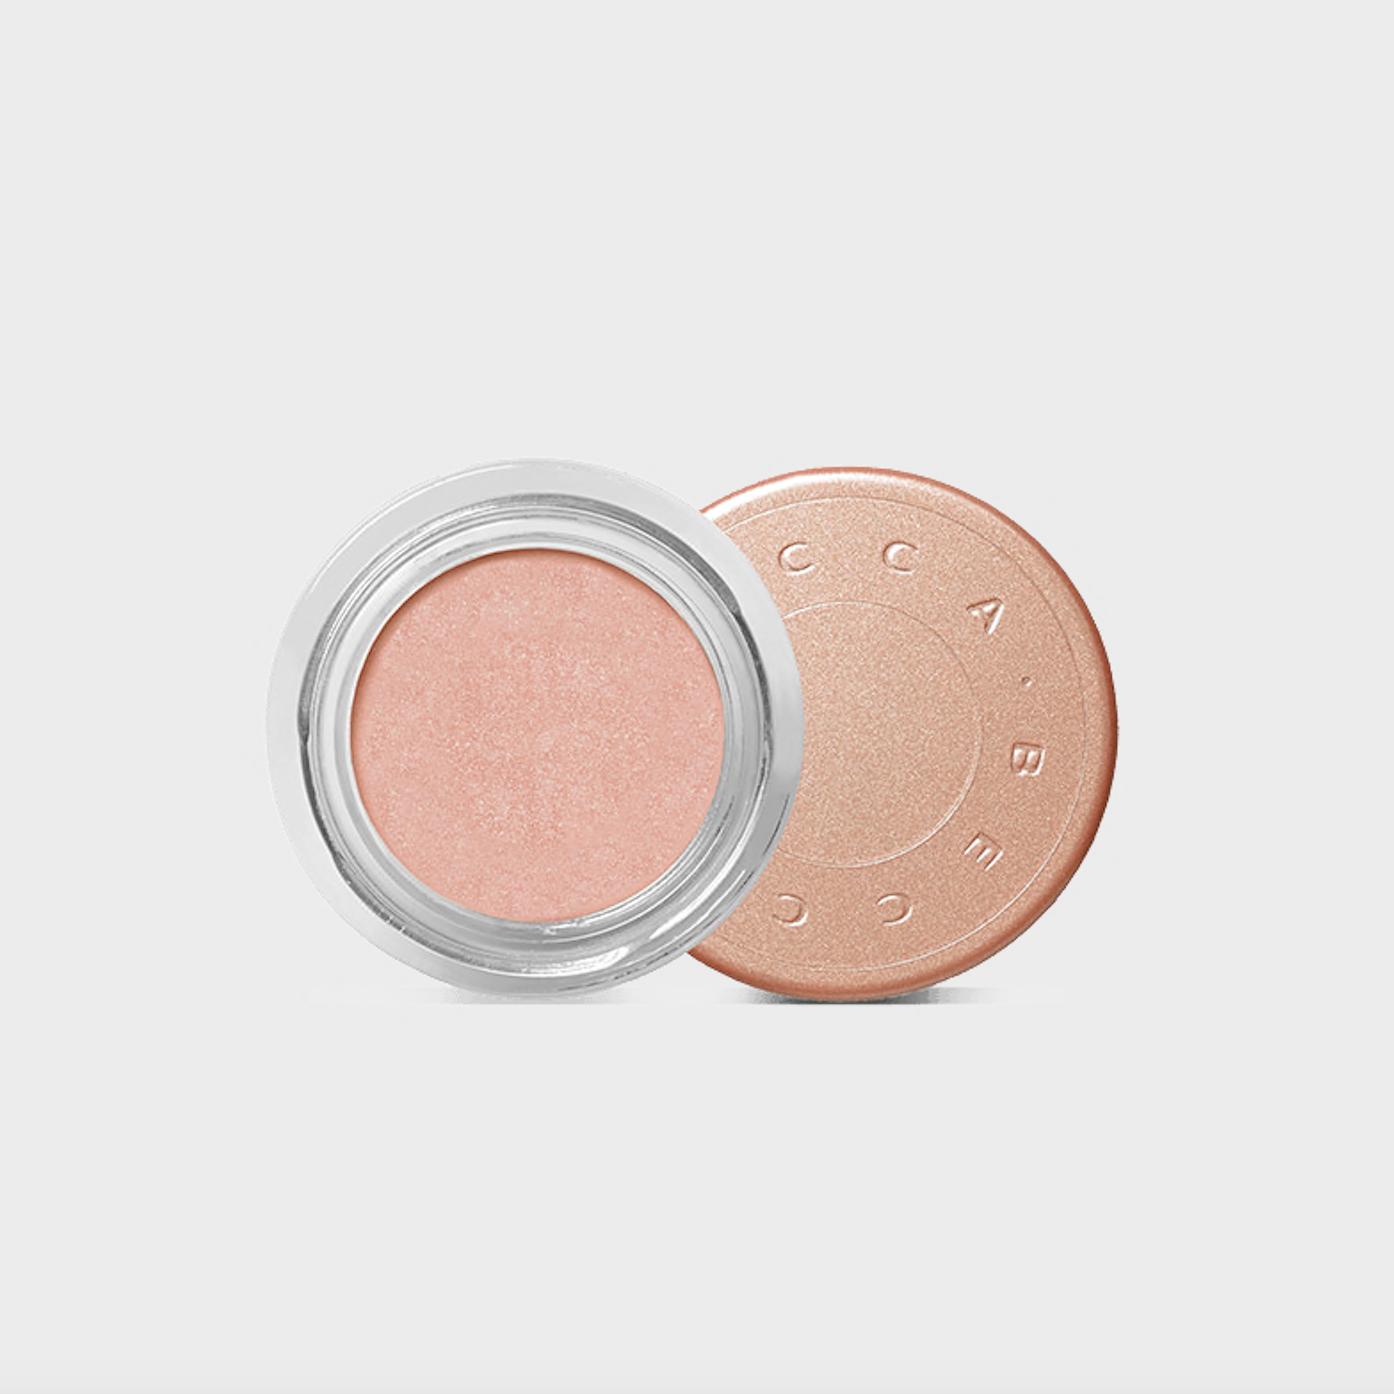 BECCA cosmetics, under eye corrector